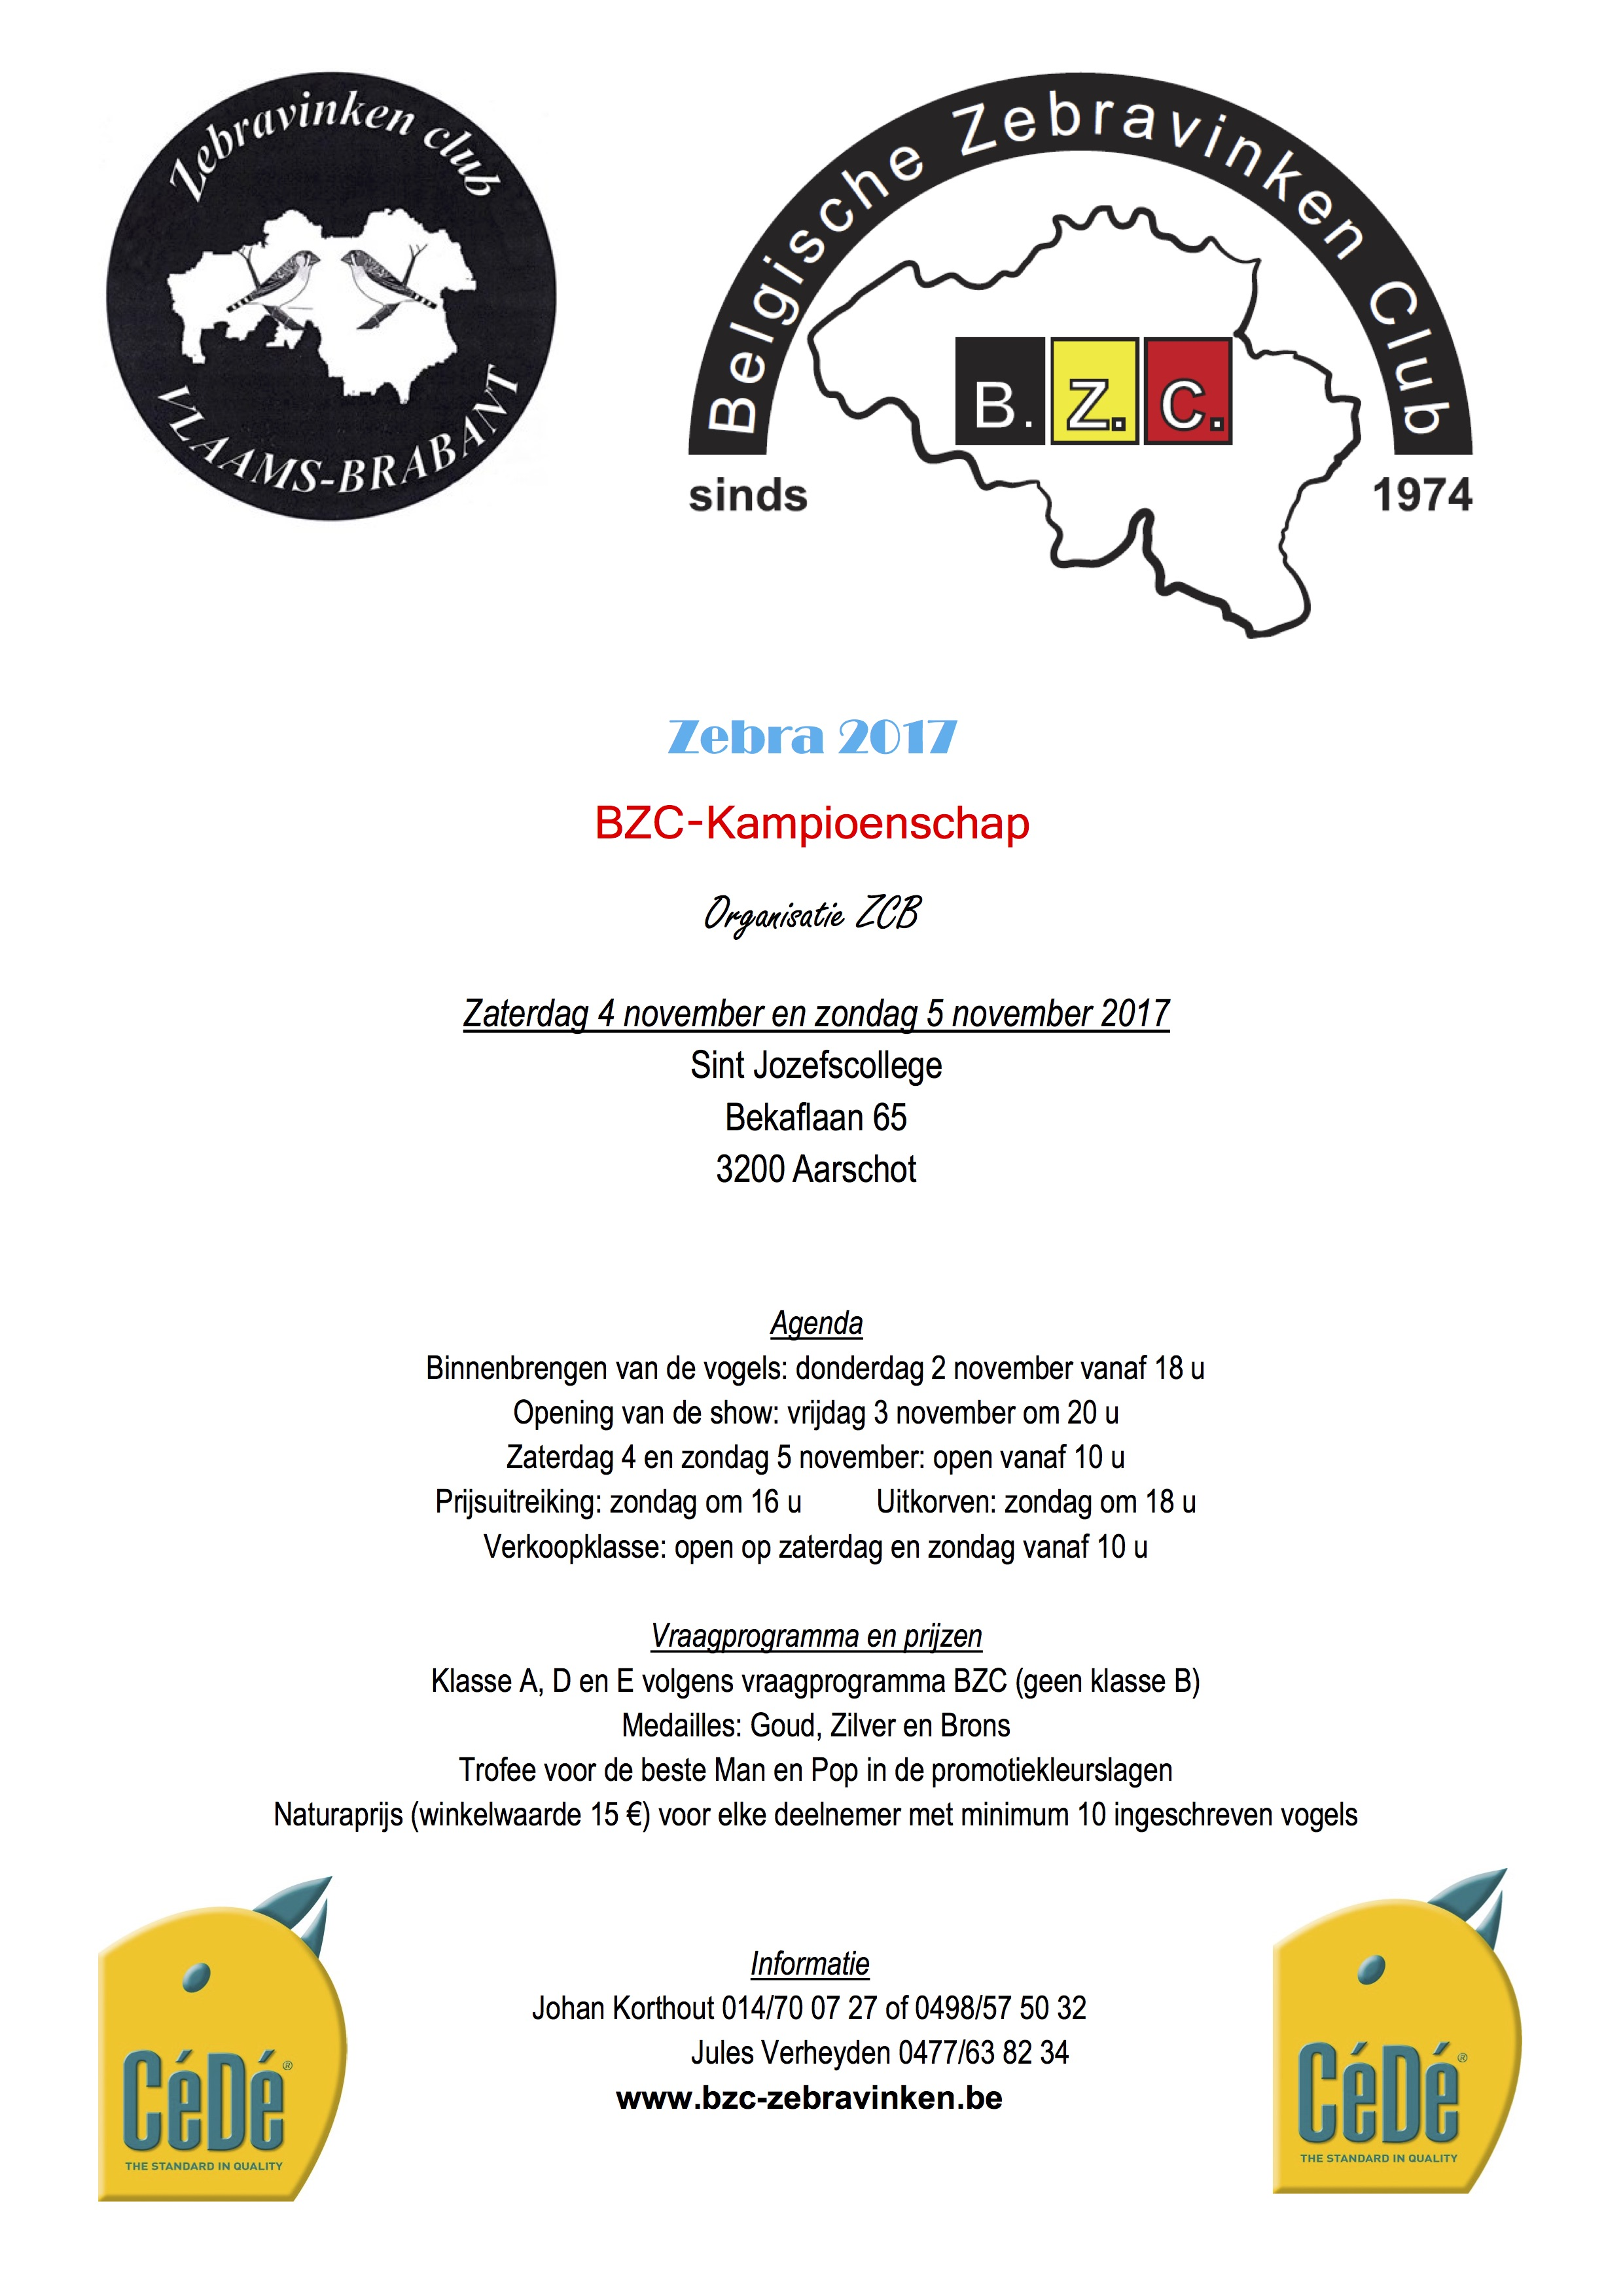 BZC Zebra 2017